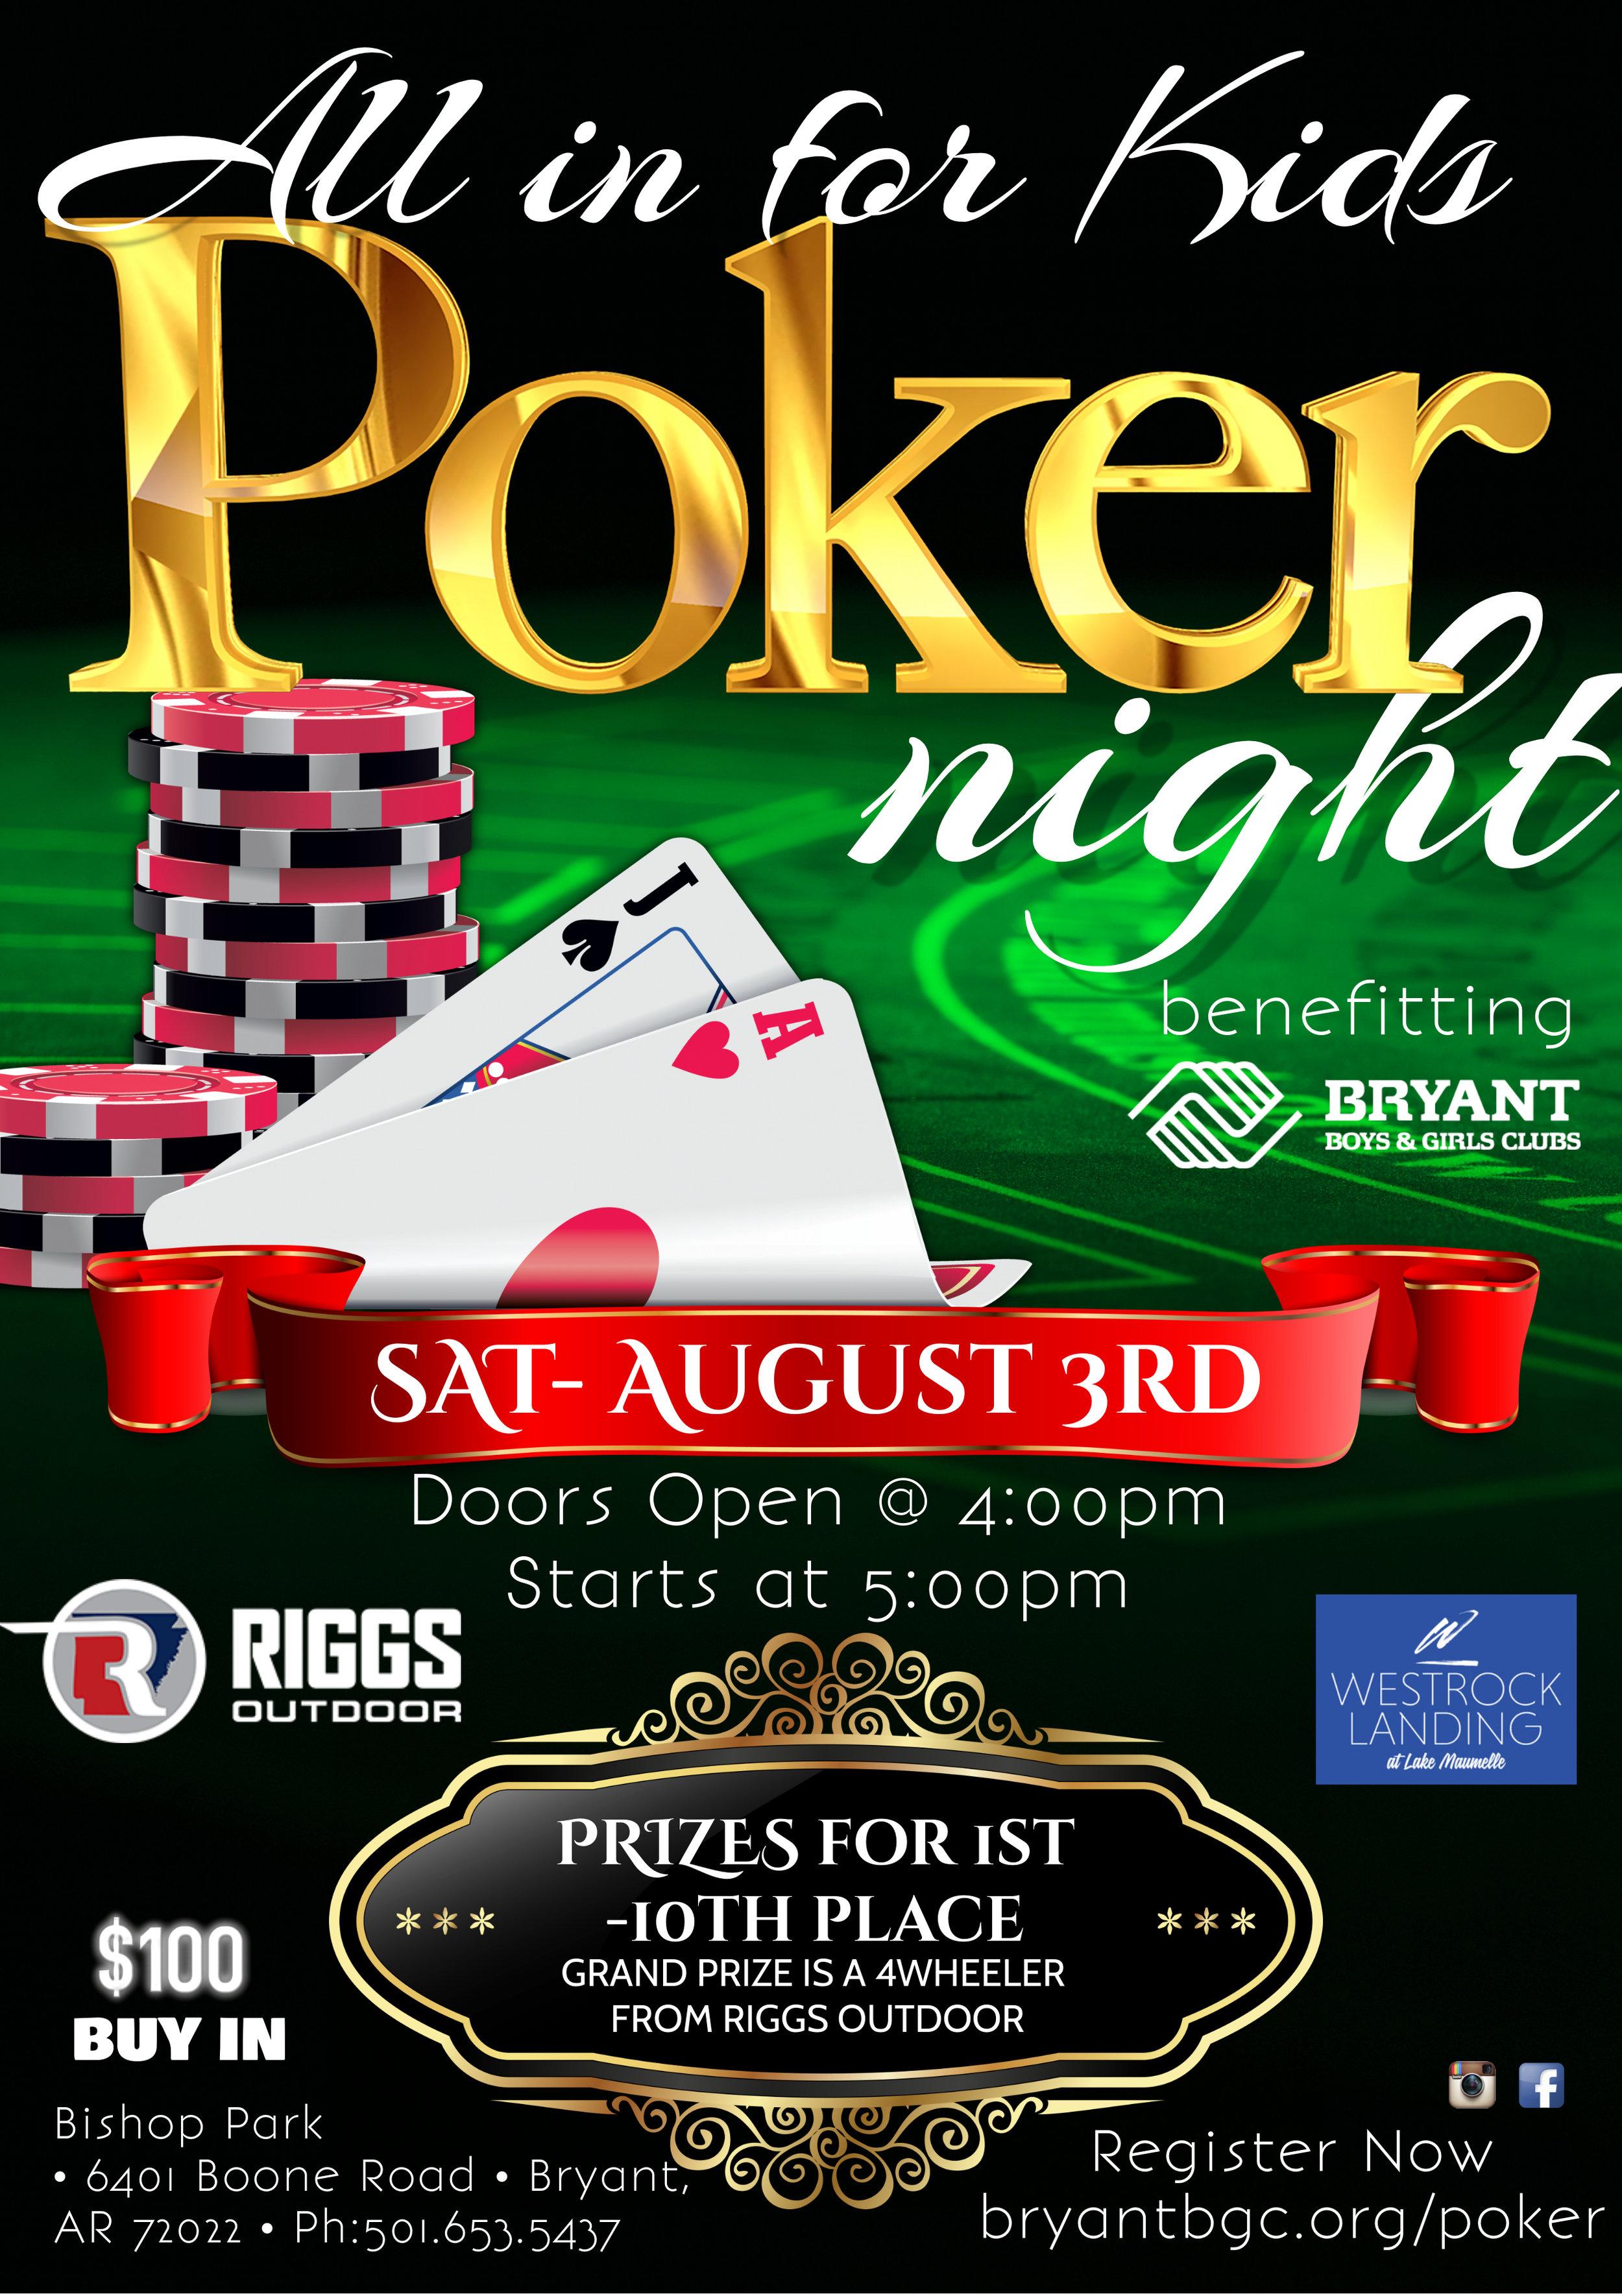 Copy of Poker Night Poster (1).jpg